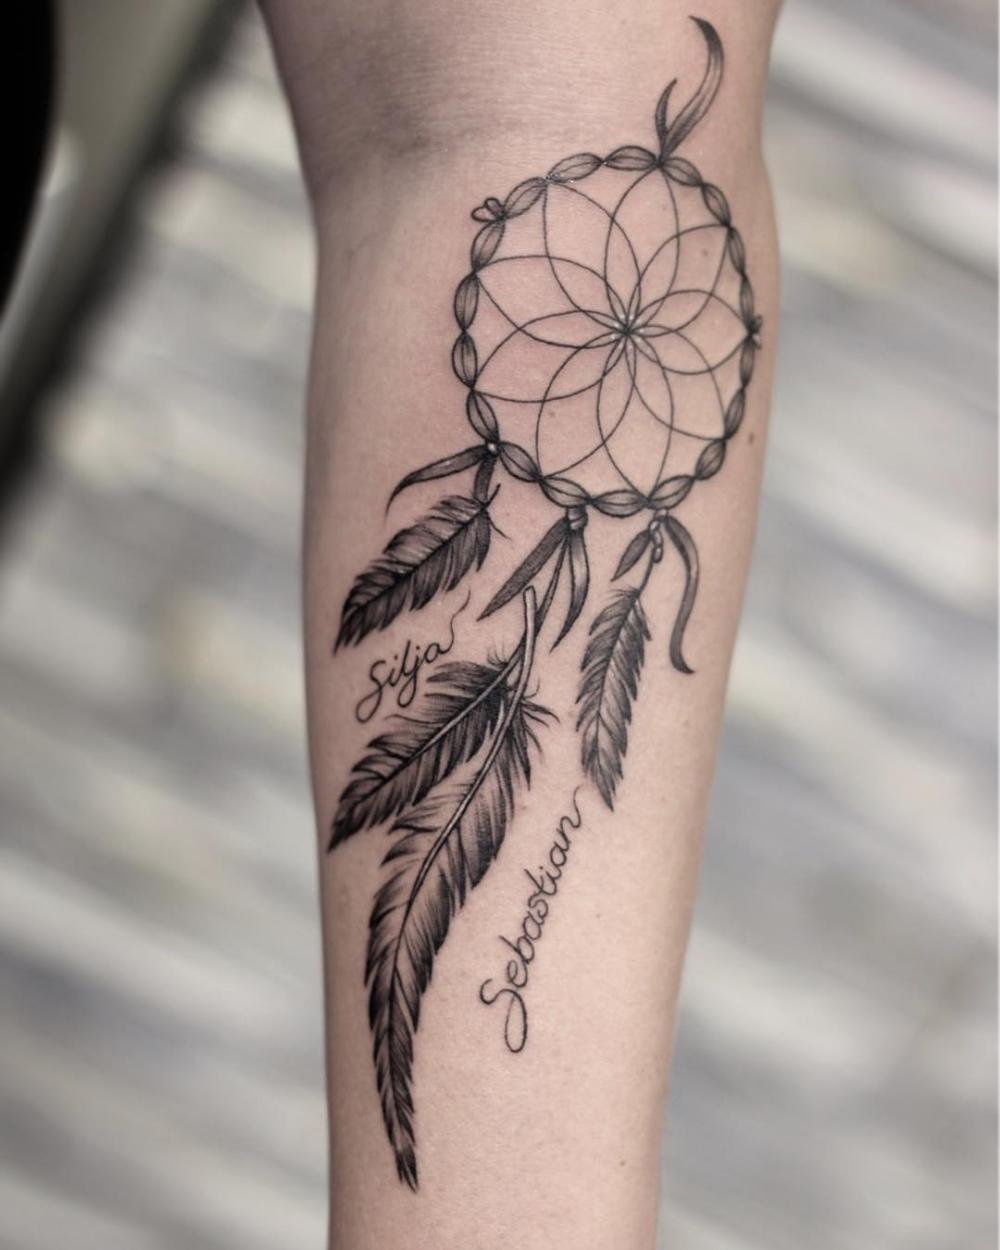 Tatouage Attrape Reve Bras : tatouage, attrape, Dream, Catcher, Tattoo, Buscar, Google, Design,, Dreamcatcher, Tattoo,, Thigh